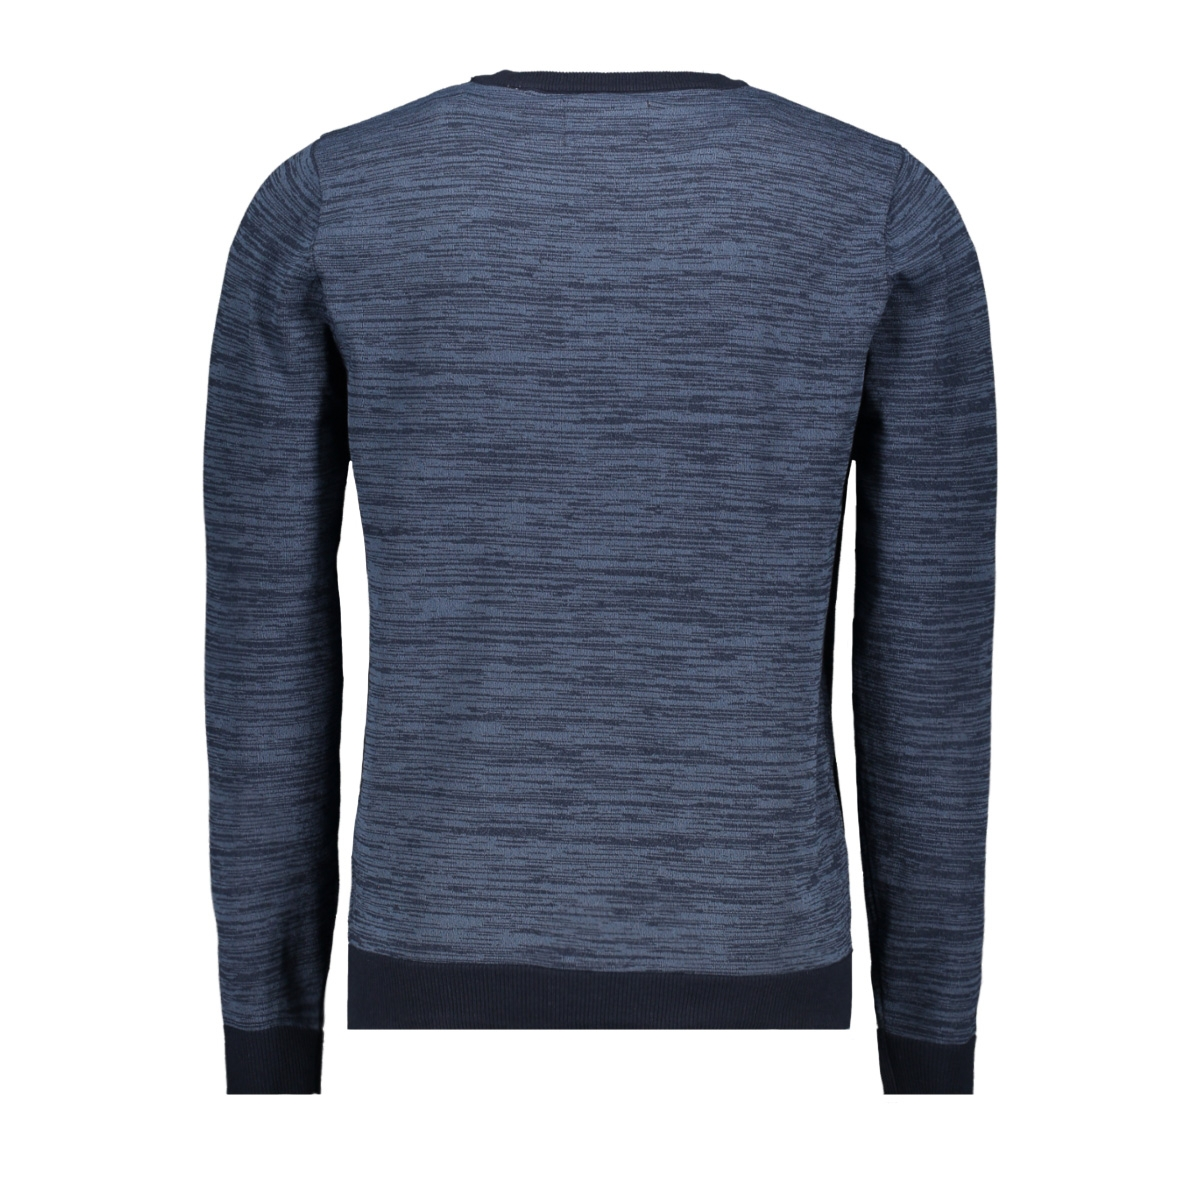 jcotonto knit crew neck 12160968 jack & jones trui sky captain/knit fit